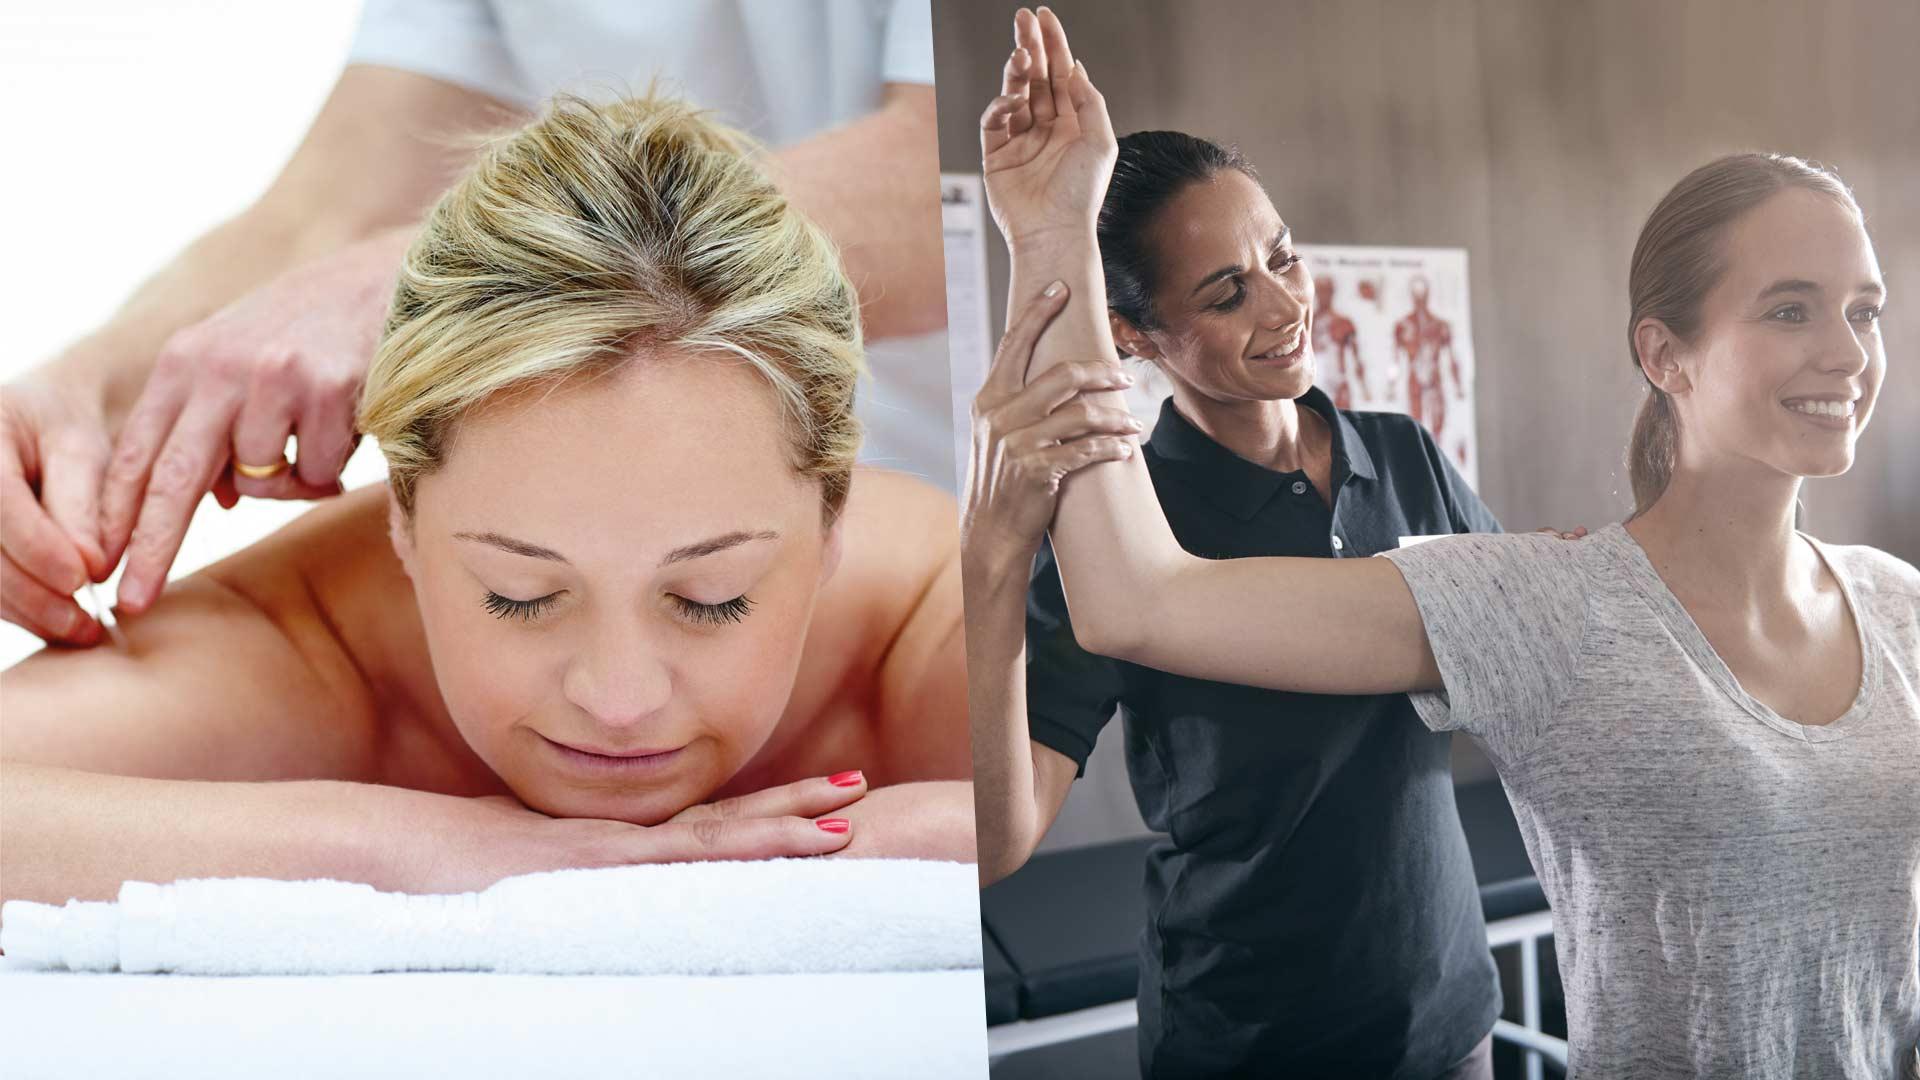 Acupunctura e Osteopatia na Lei de Bases da Saúde